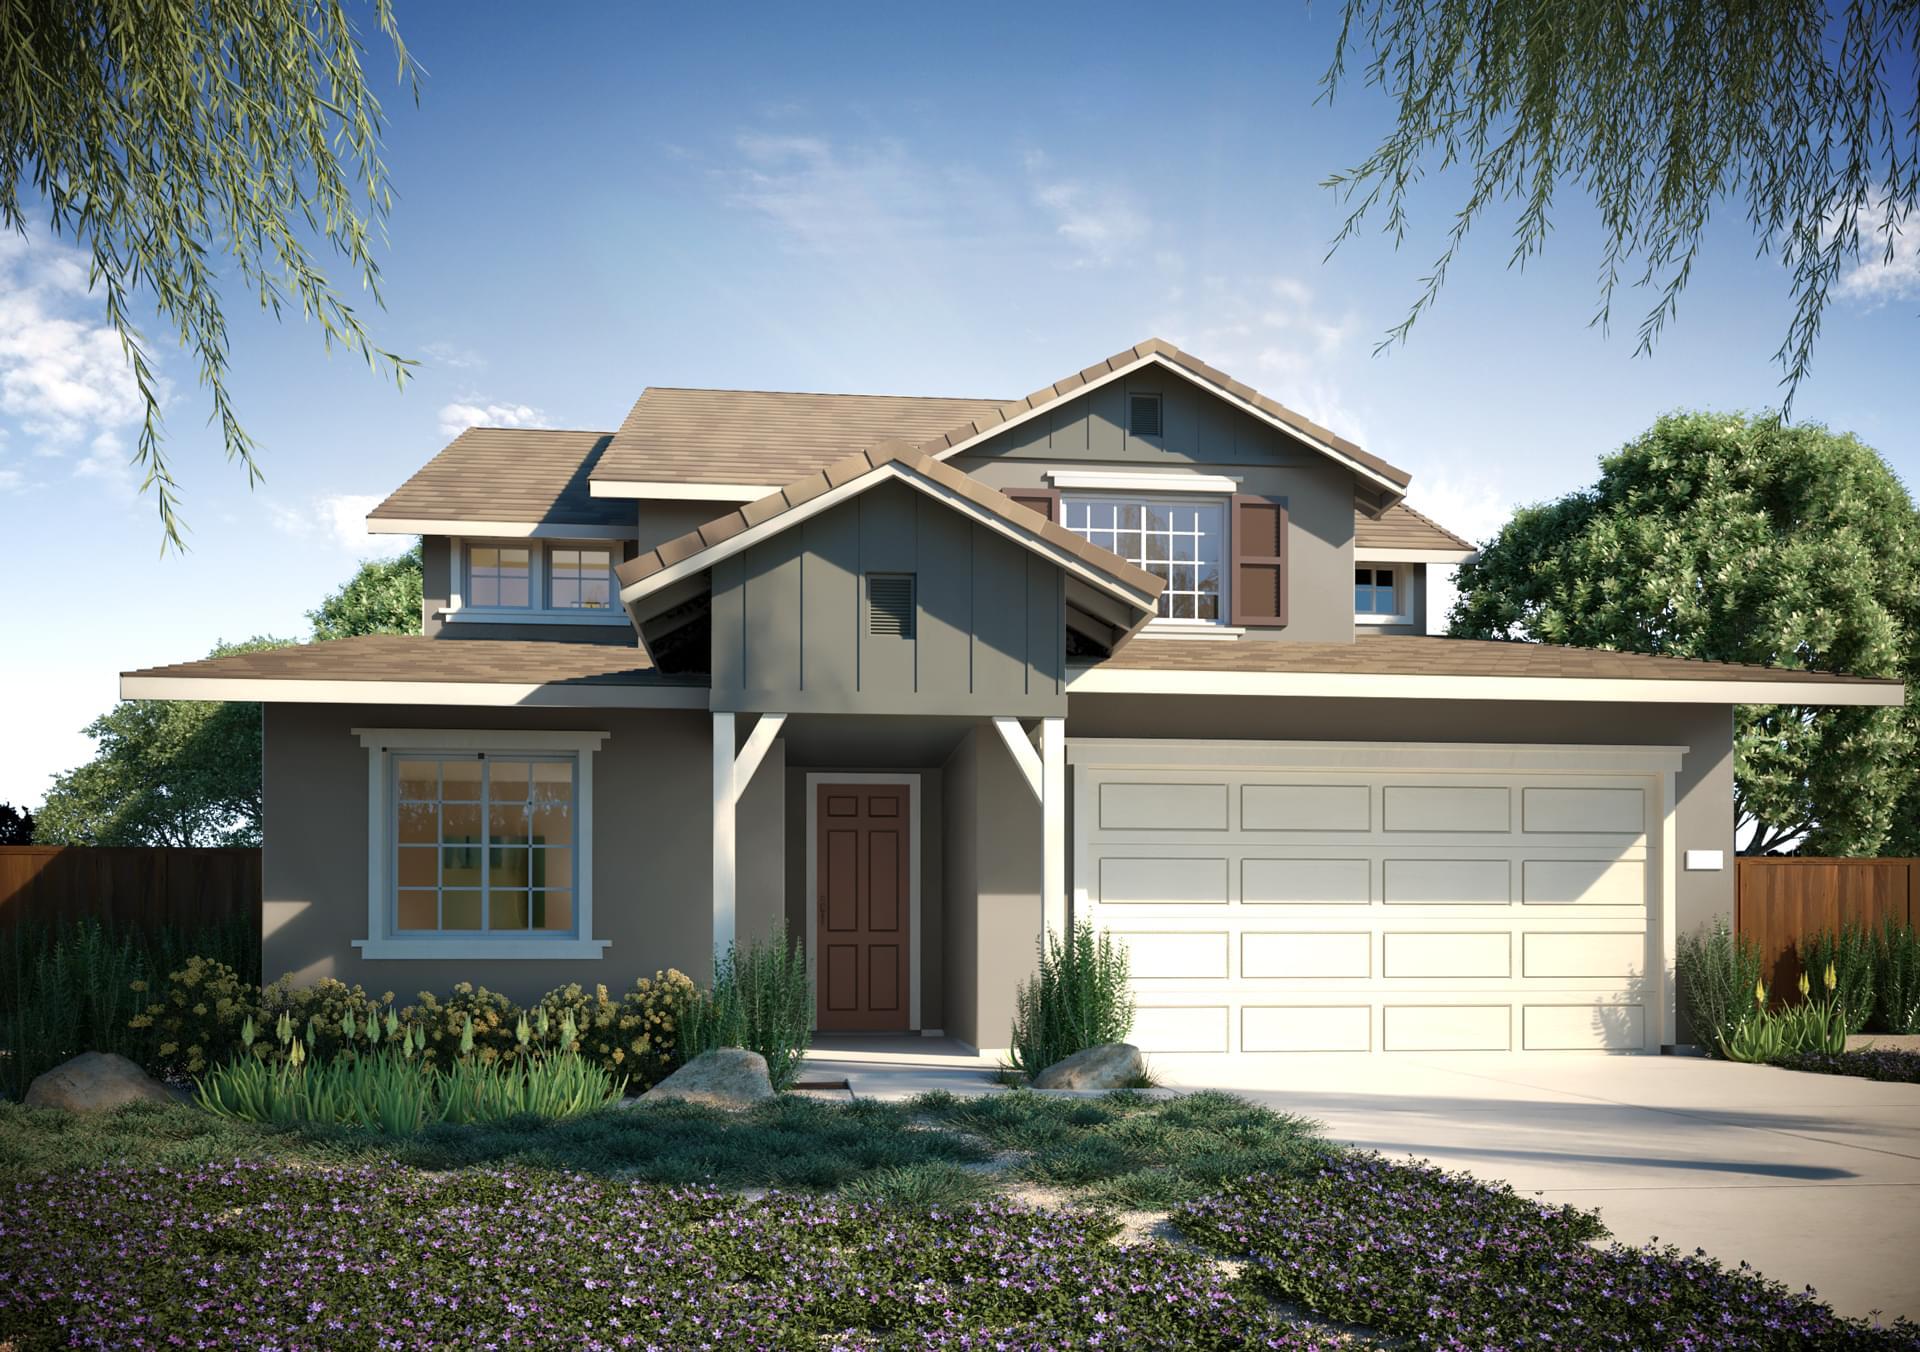 535 Tananger Heights Lane in , CA by DeNova Homes